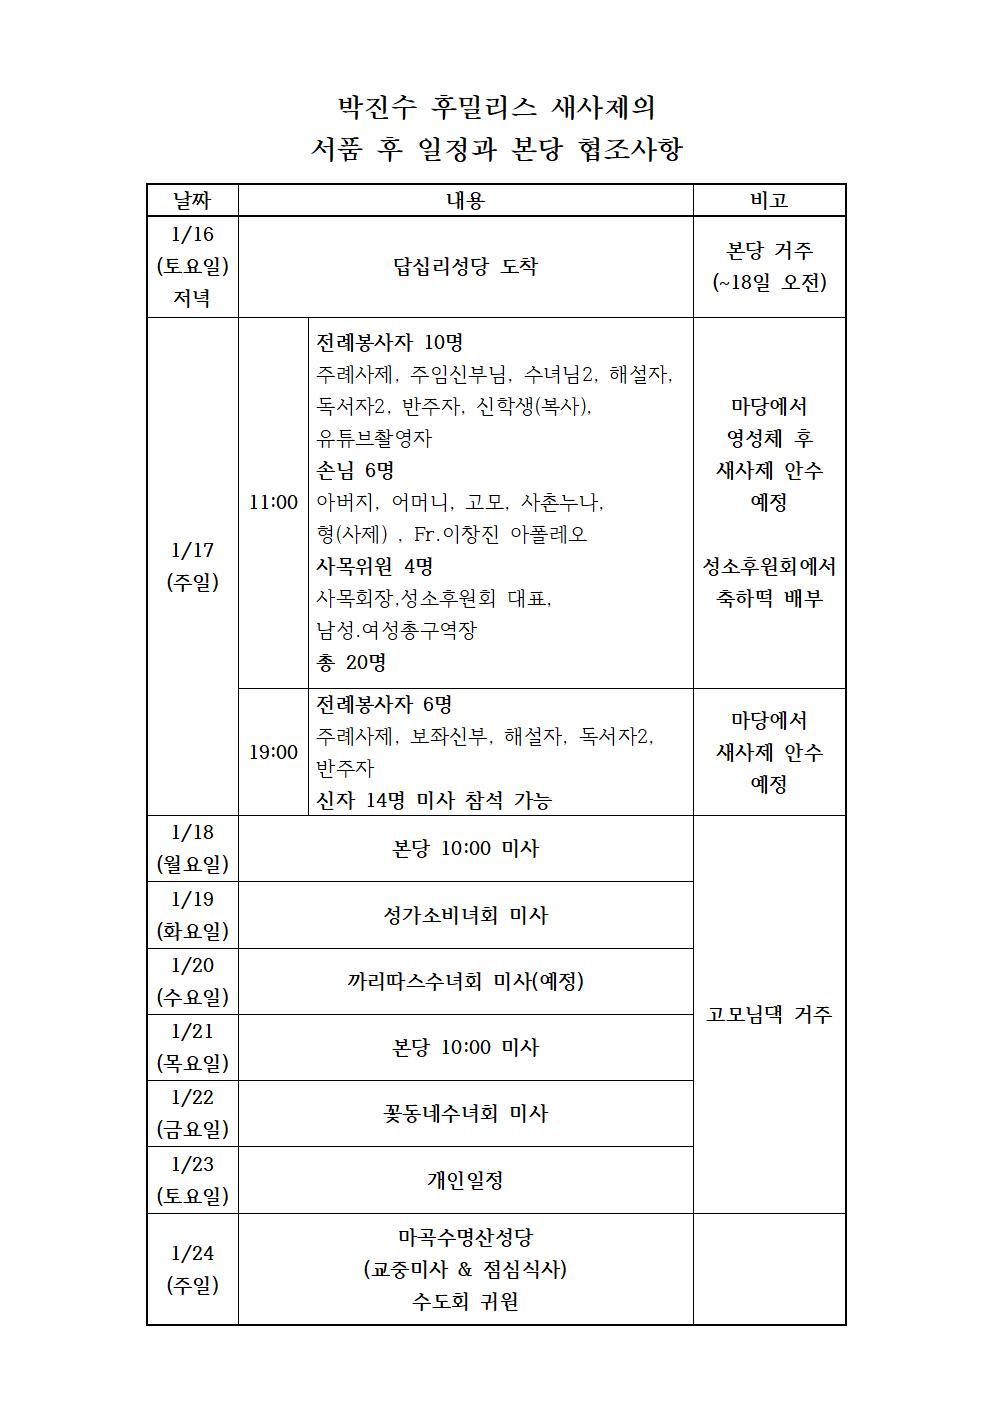 KakaoTalk_20210111_새사제안내.jpg